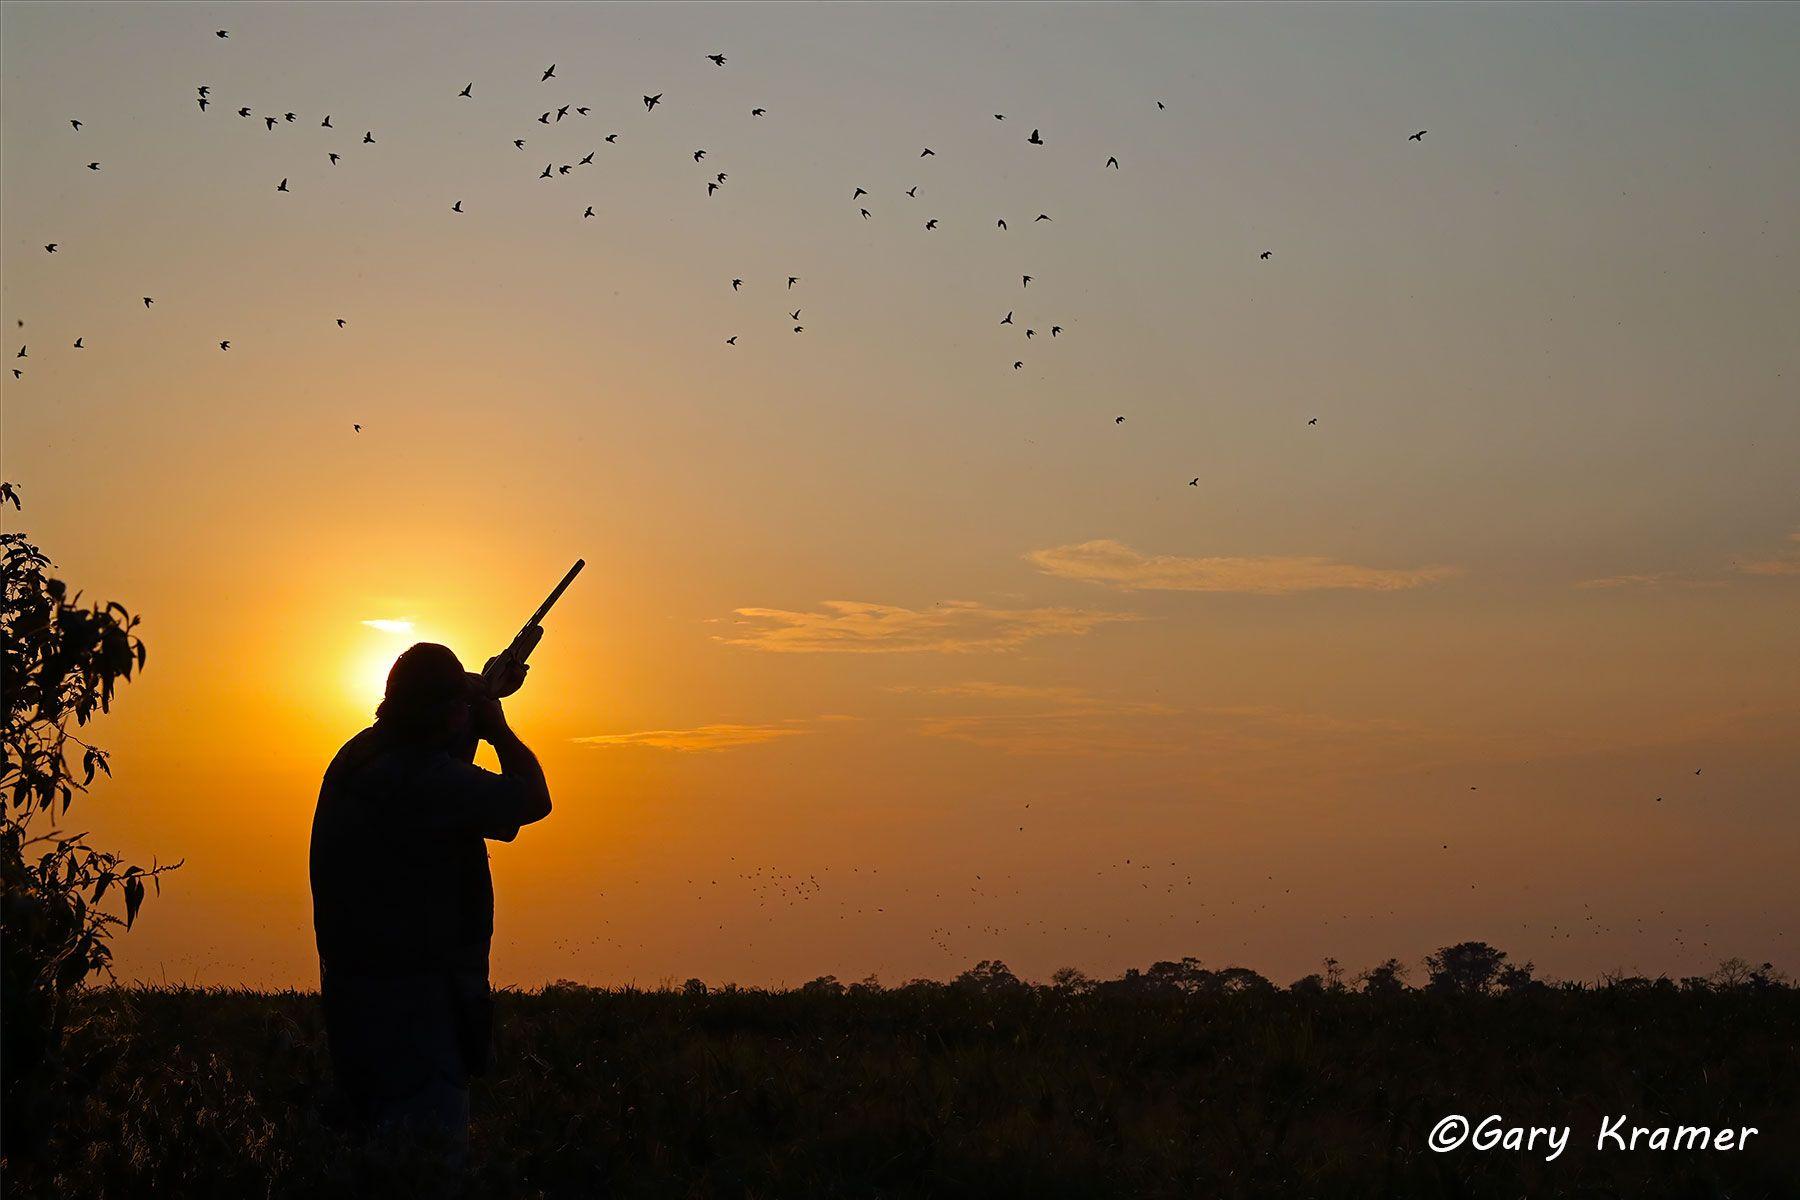 Hunter shooting at Eared Doves at Sunrise/Sunset, Bolivia - SHDess#037d